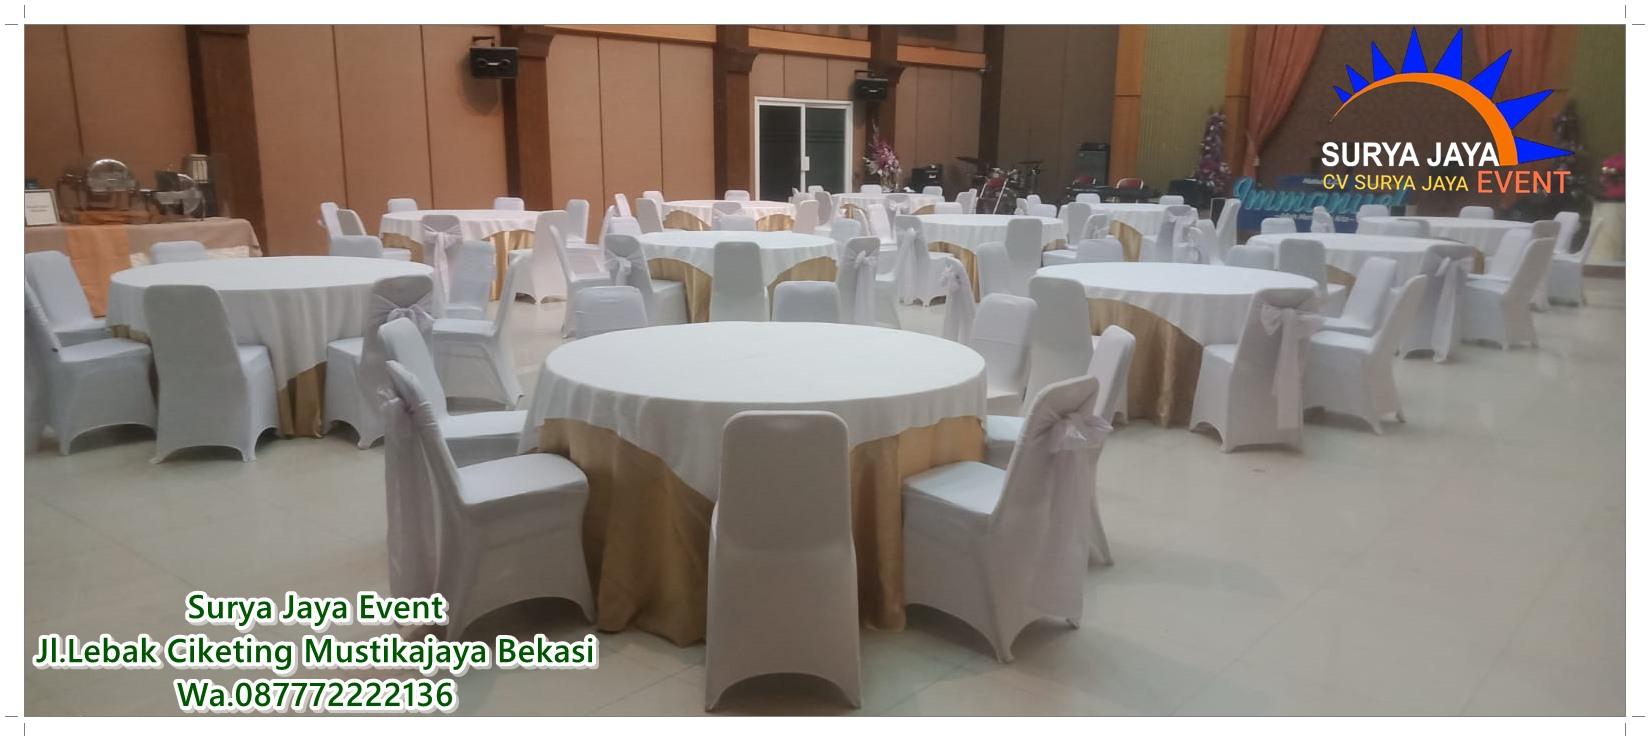 Sewa Round Table Bercover Untuk Acara